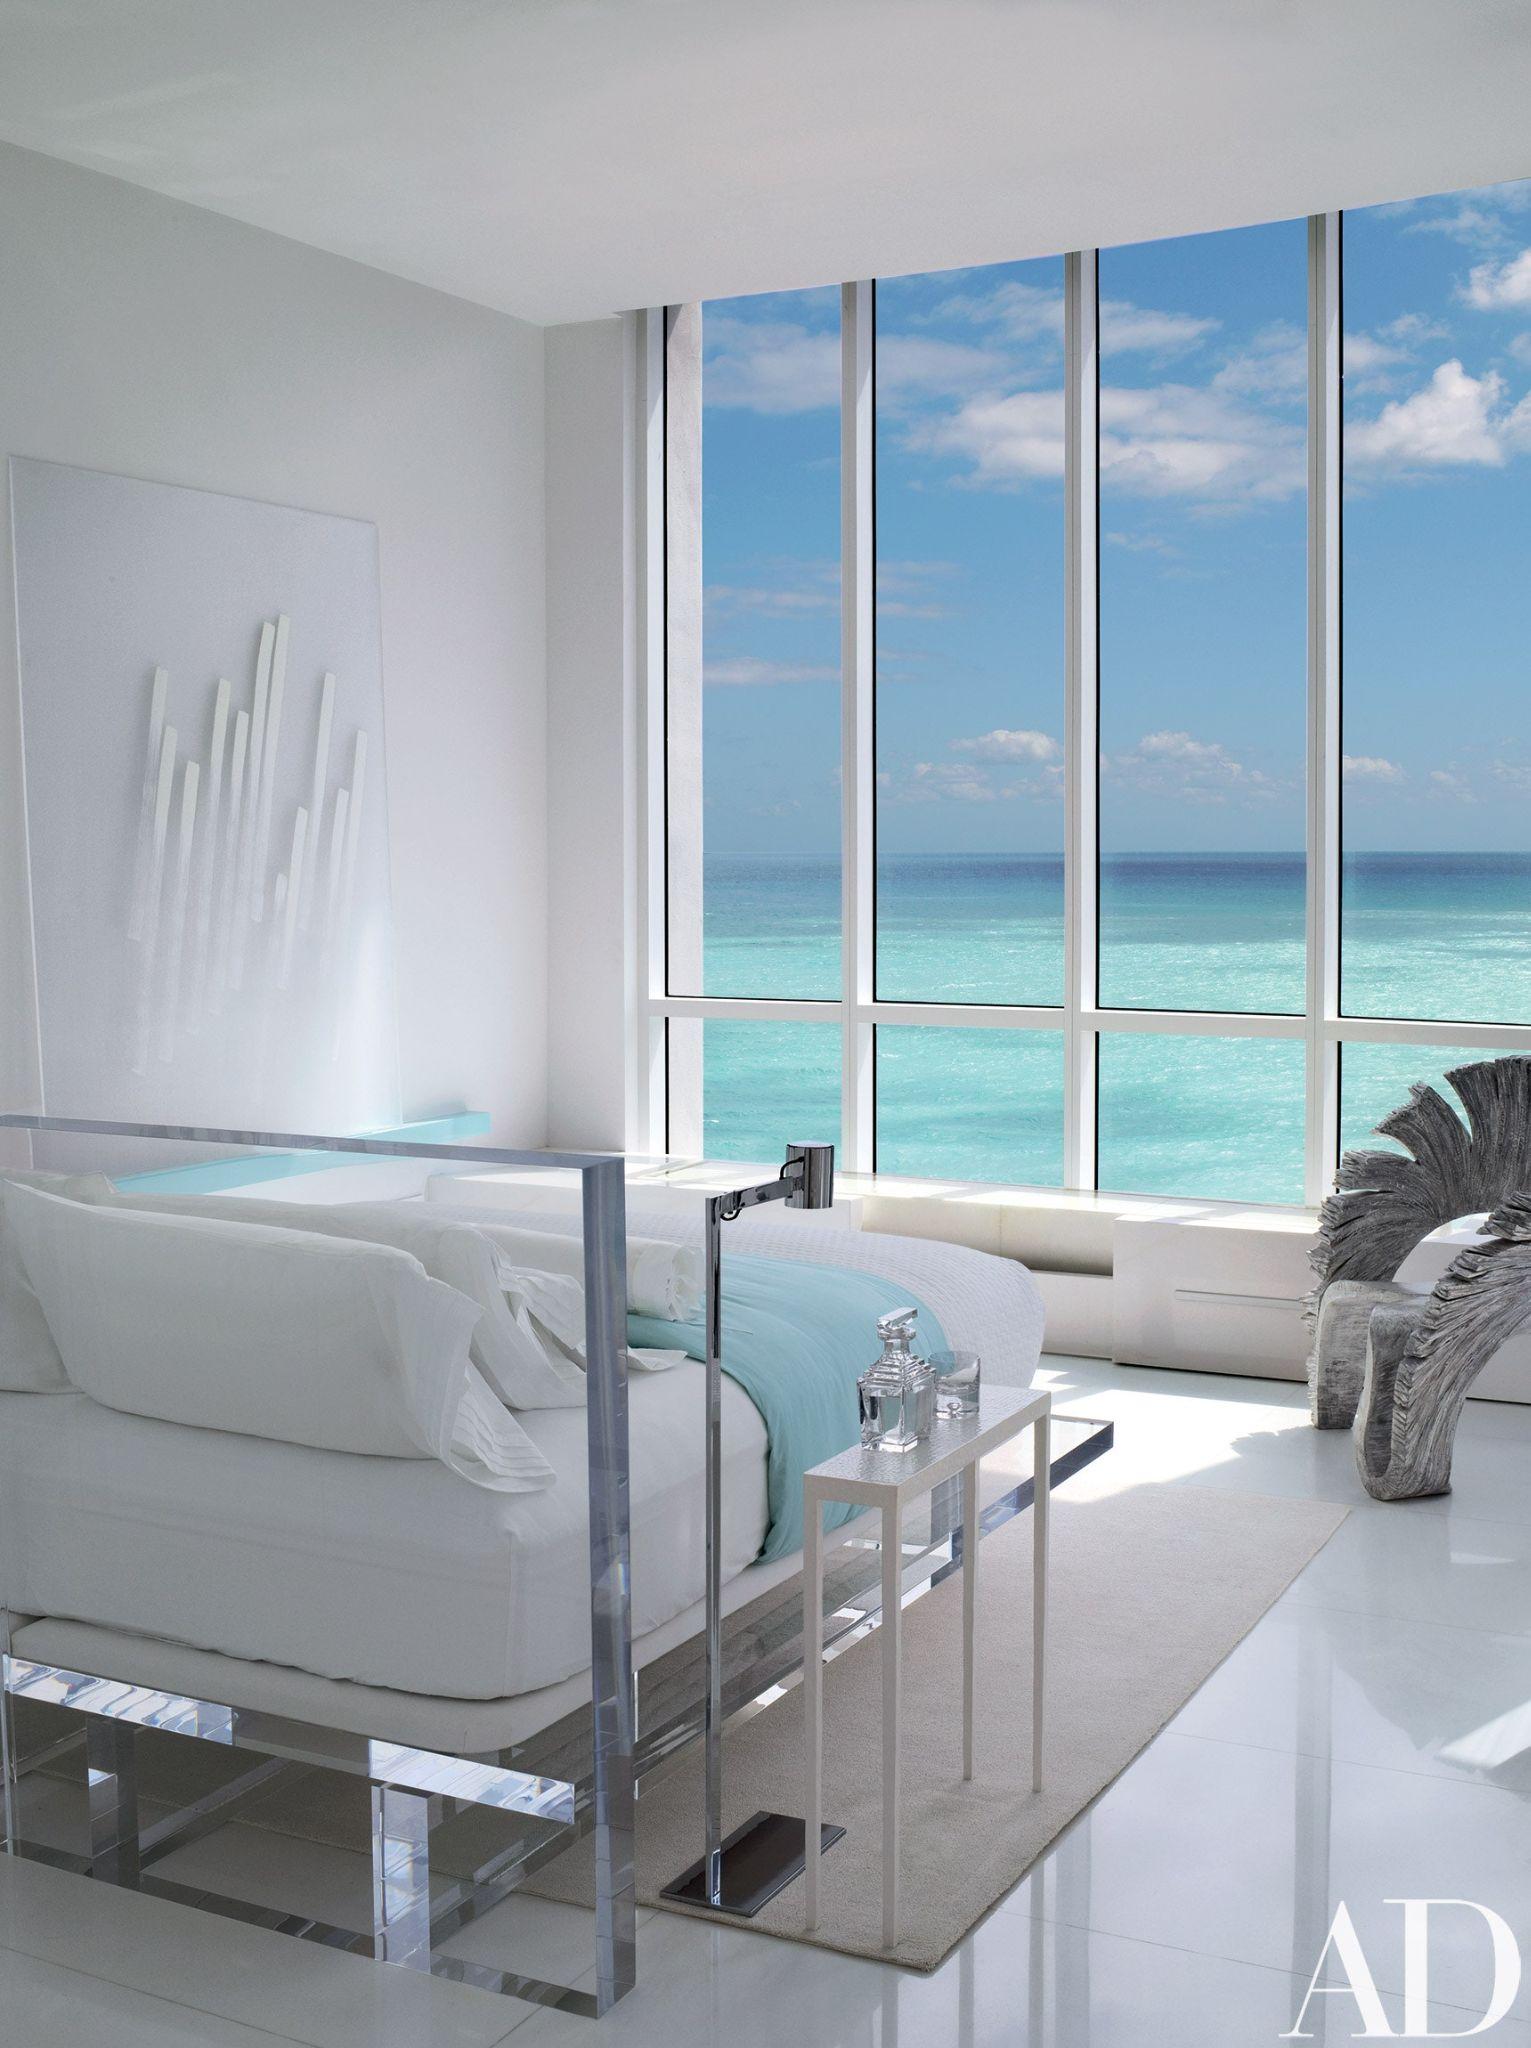 Minimalist Haven Bedroom with Beach View